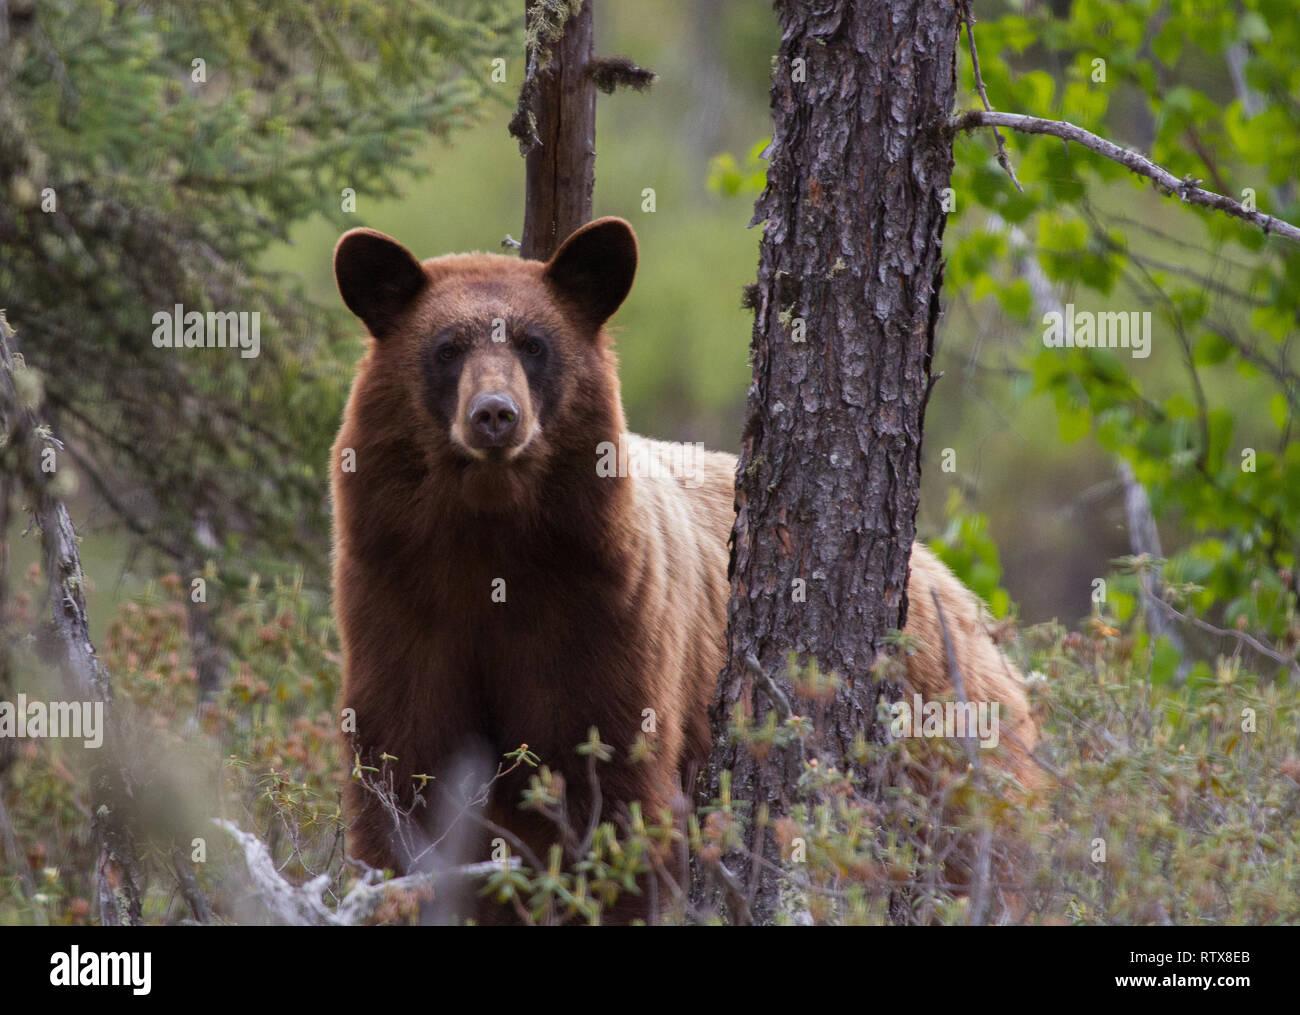 A black bear at home in northern Saskatchewan, Canada Stock Photo